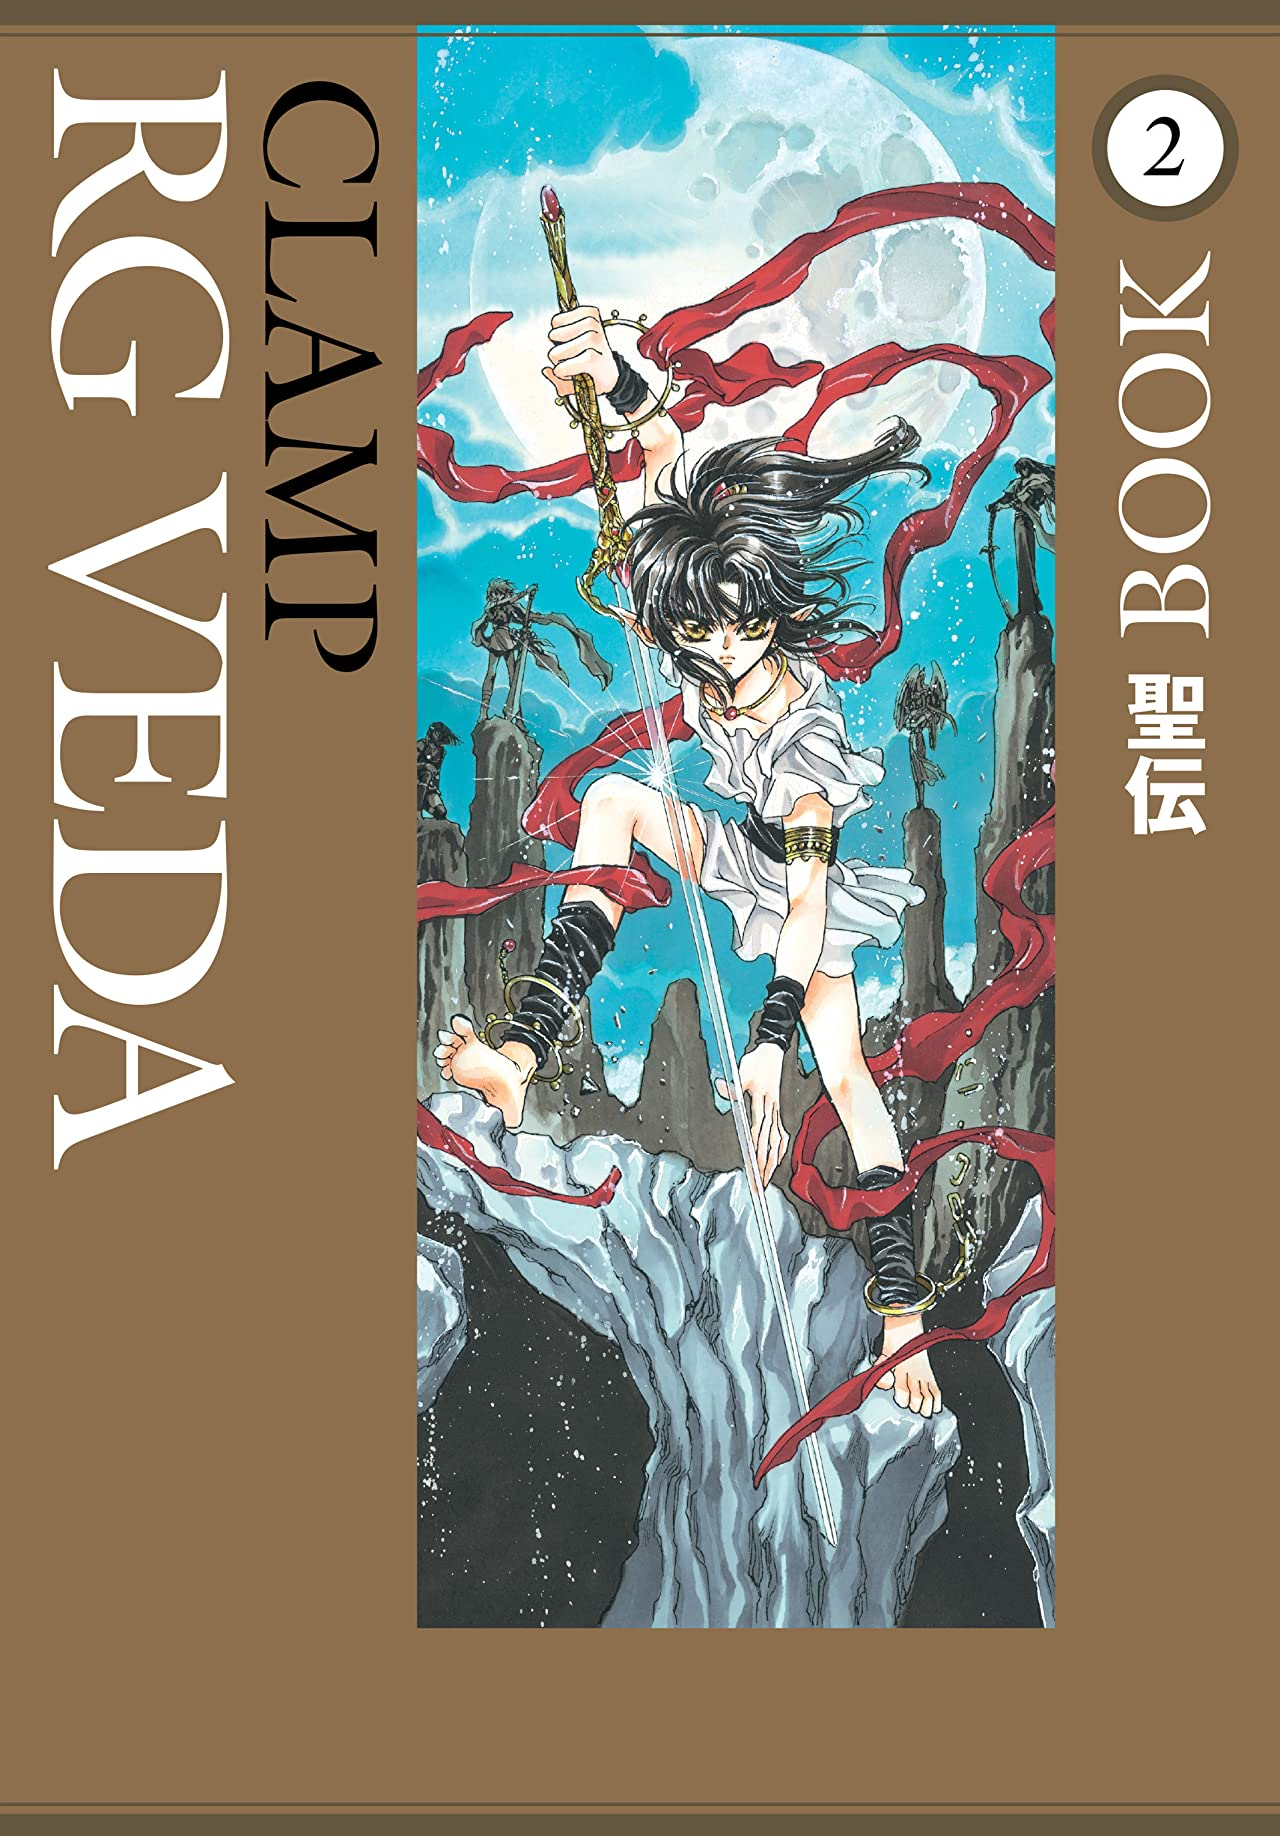 RG Veda Omnibus Vol. 2